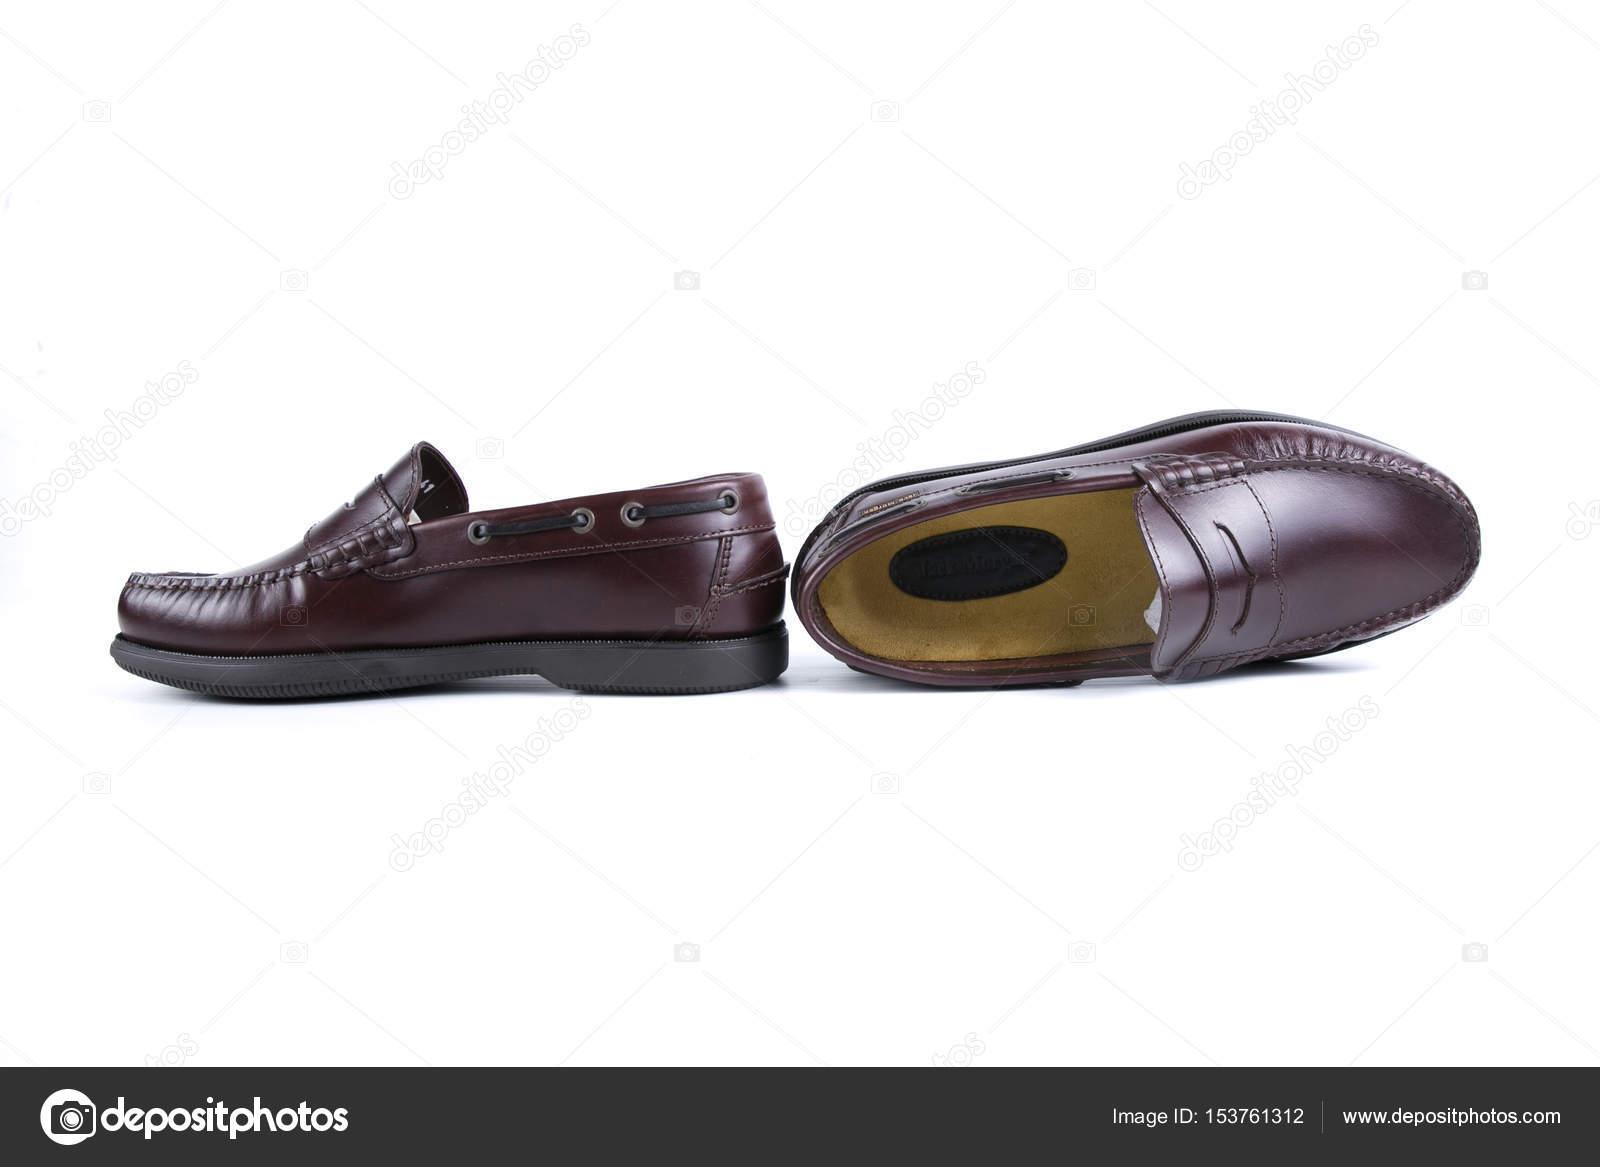 3dd34257d4 Zapatos cuero calidad — Fotos de Stock © georgevieirasilva  153761312